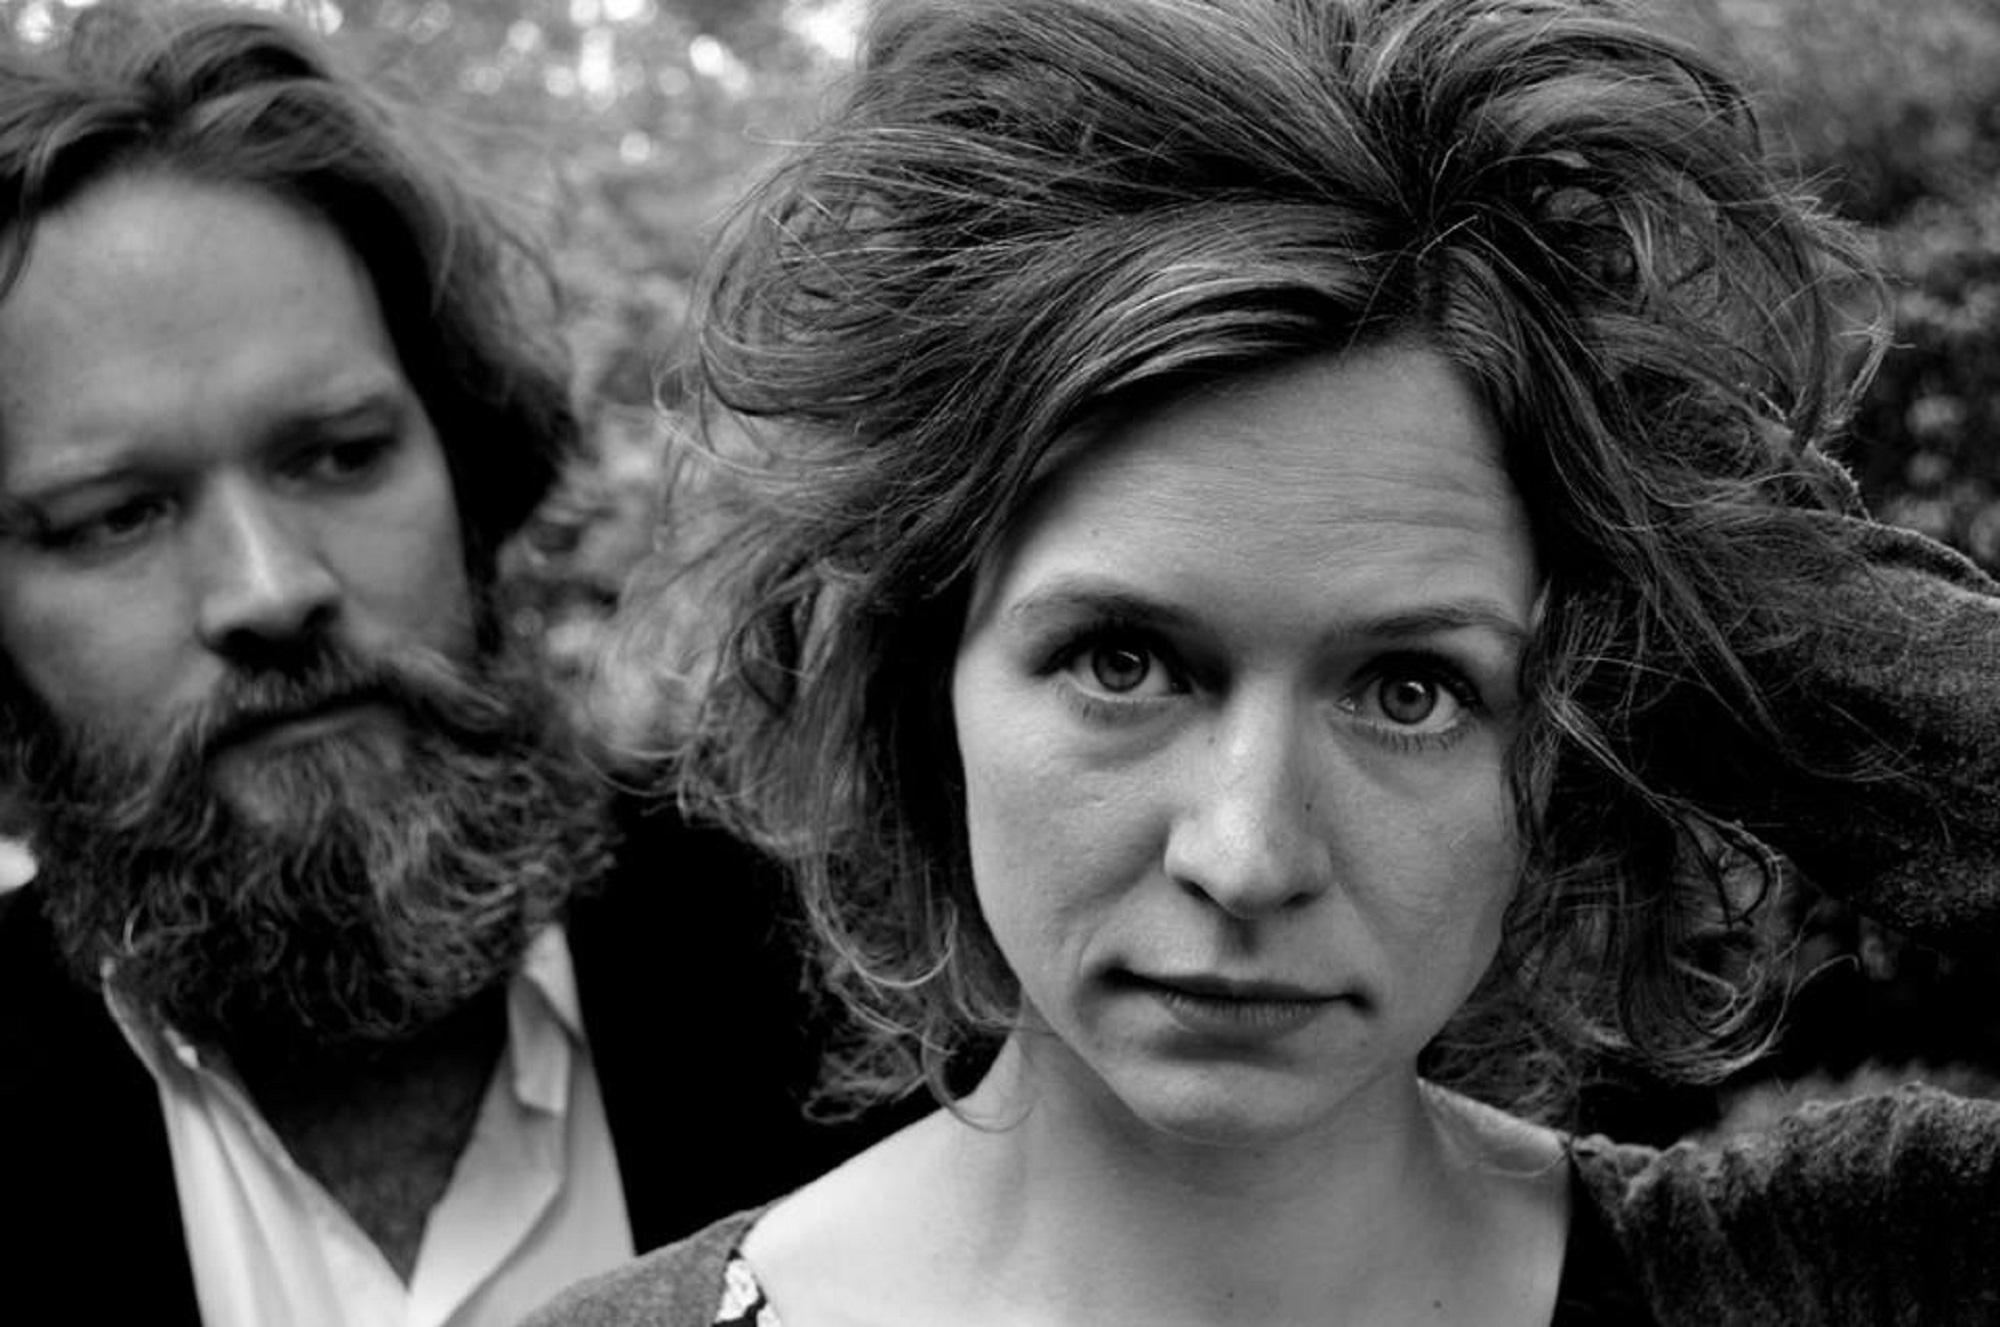 Fredrik Kinbom & Sonja Kessner